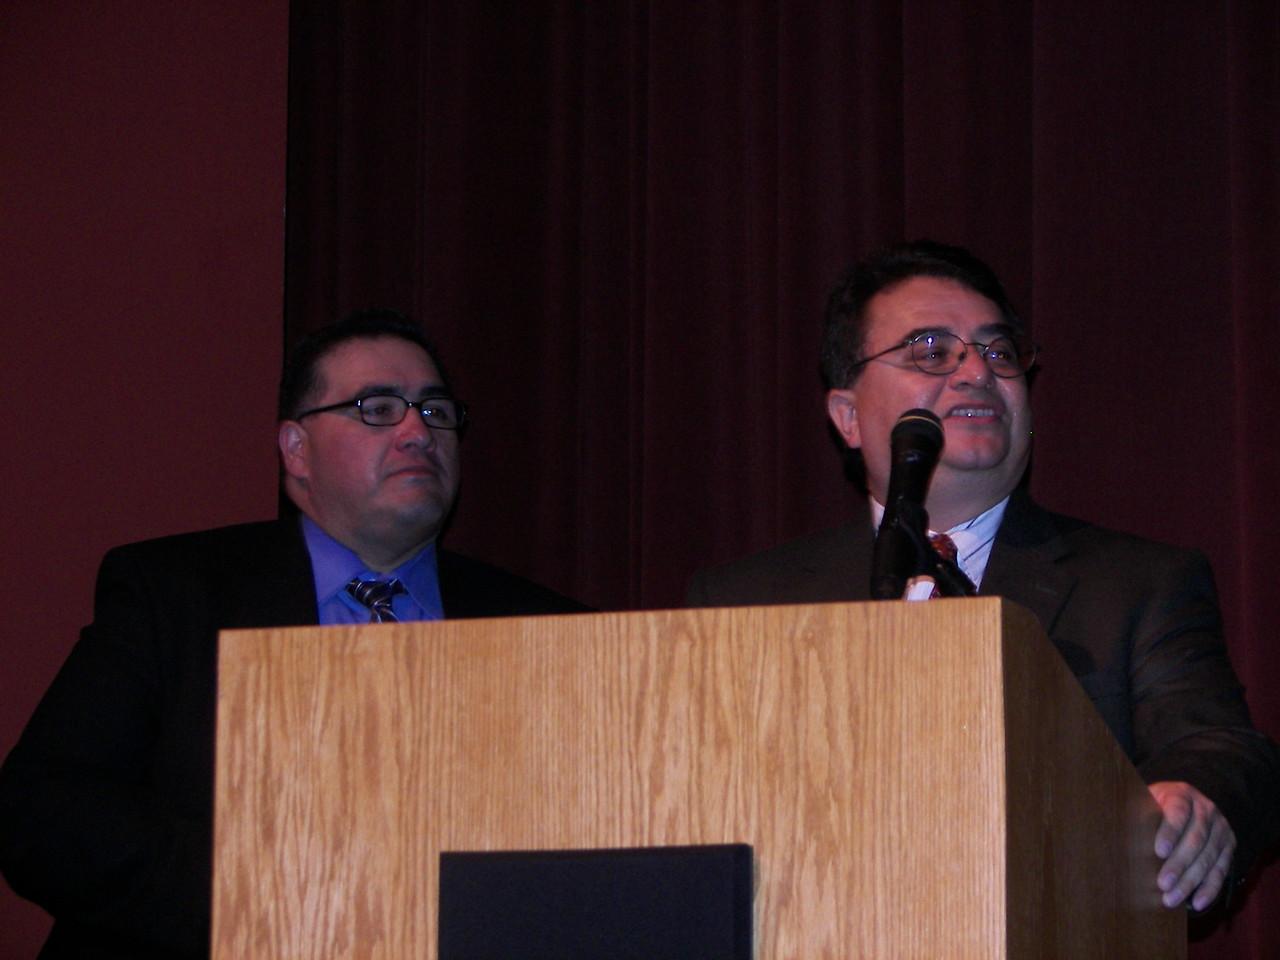 John H. Martinez-D. and Chris Escobedo